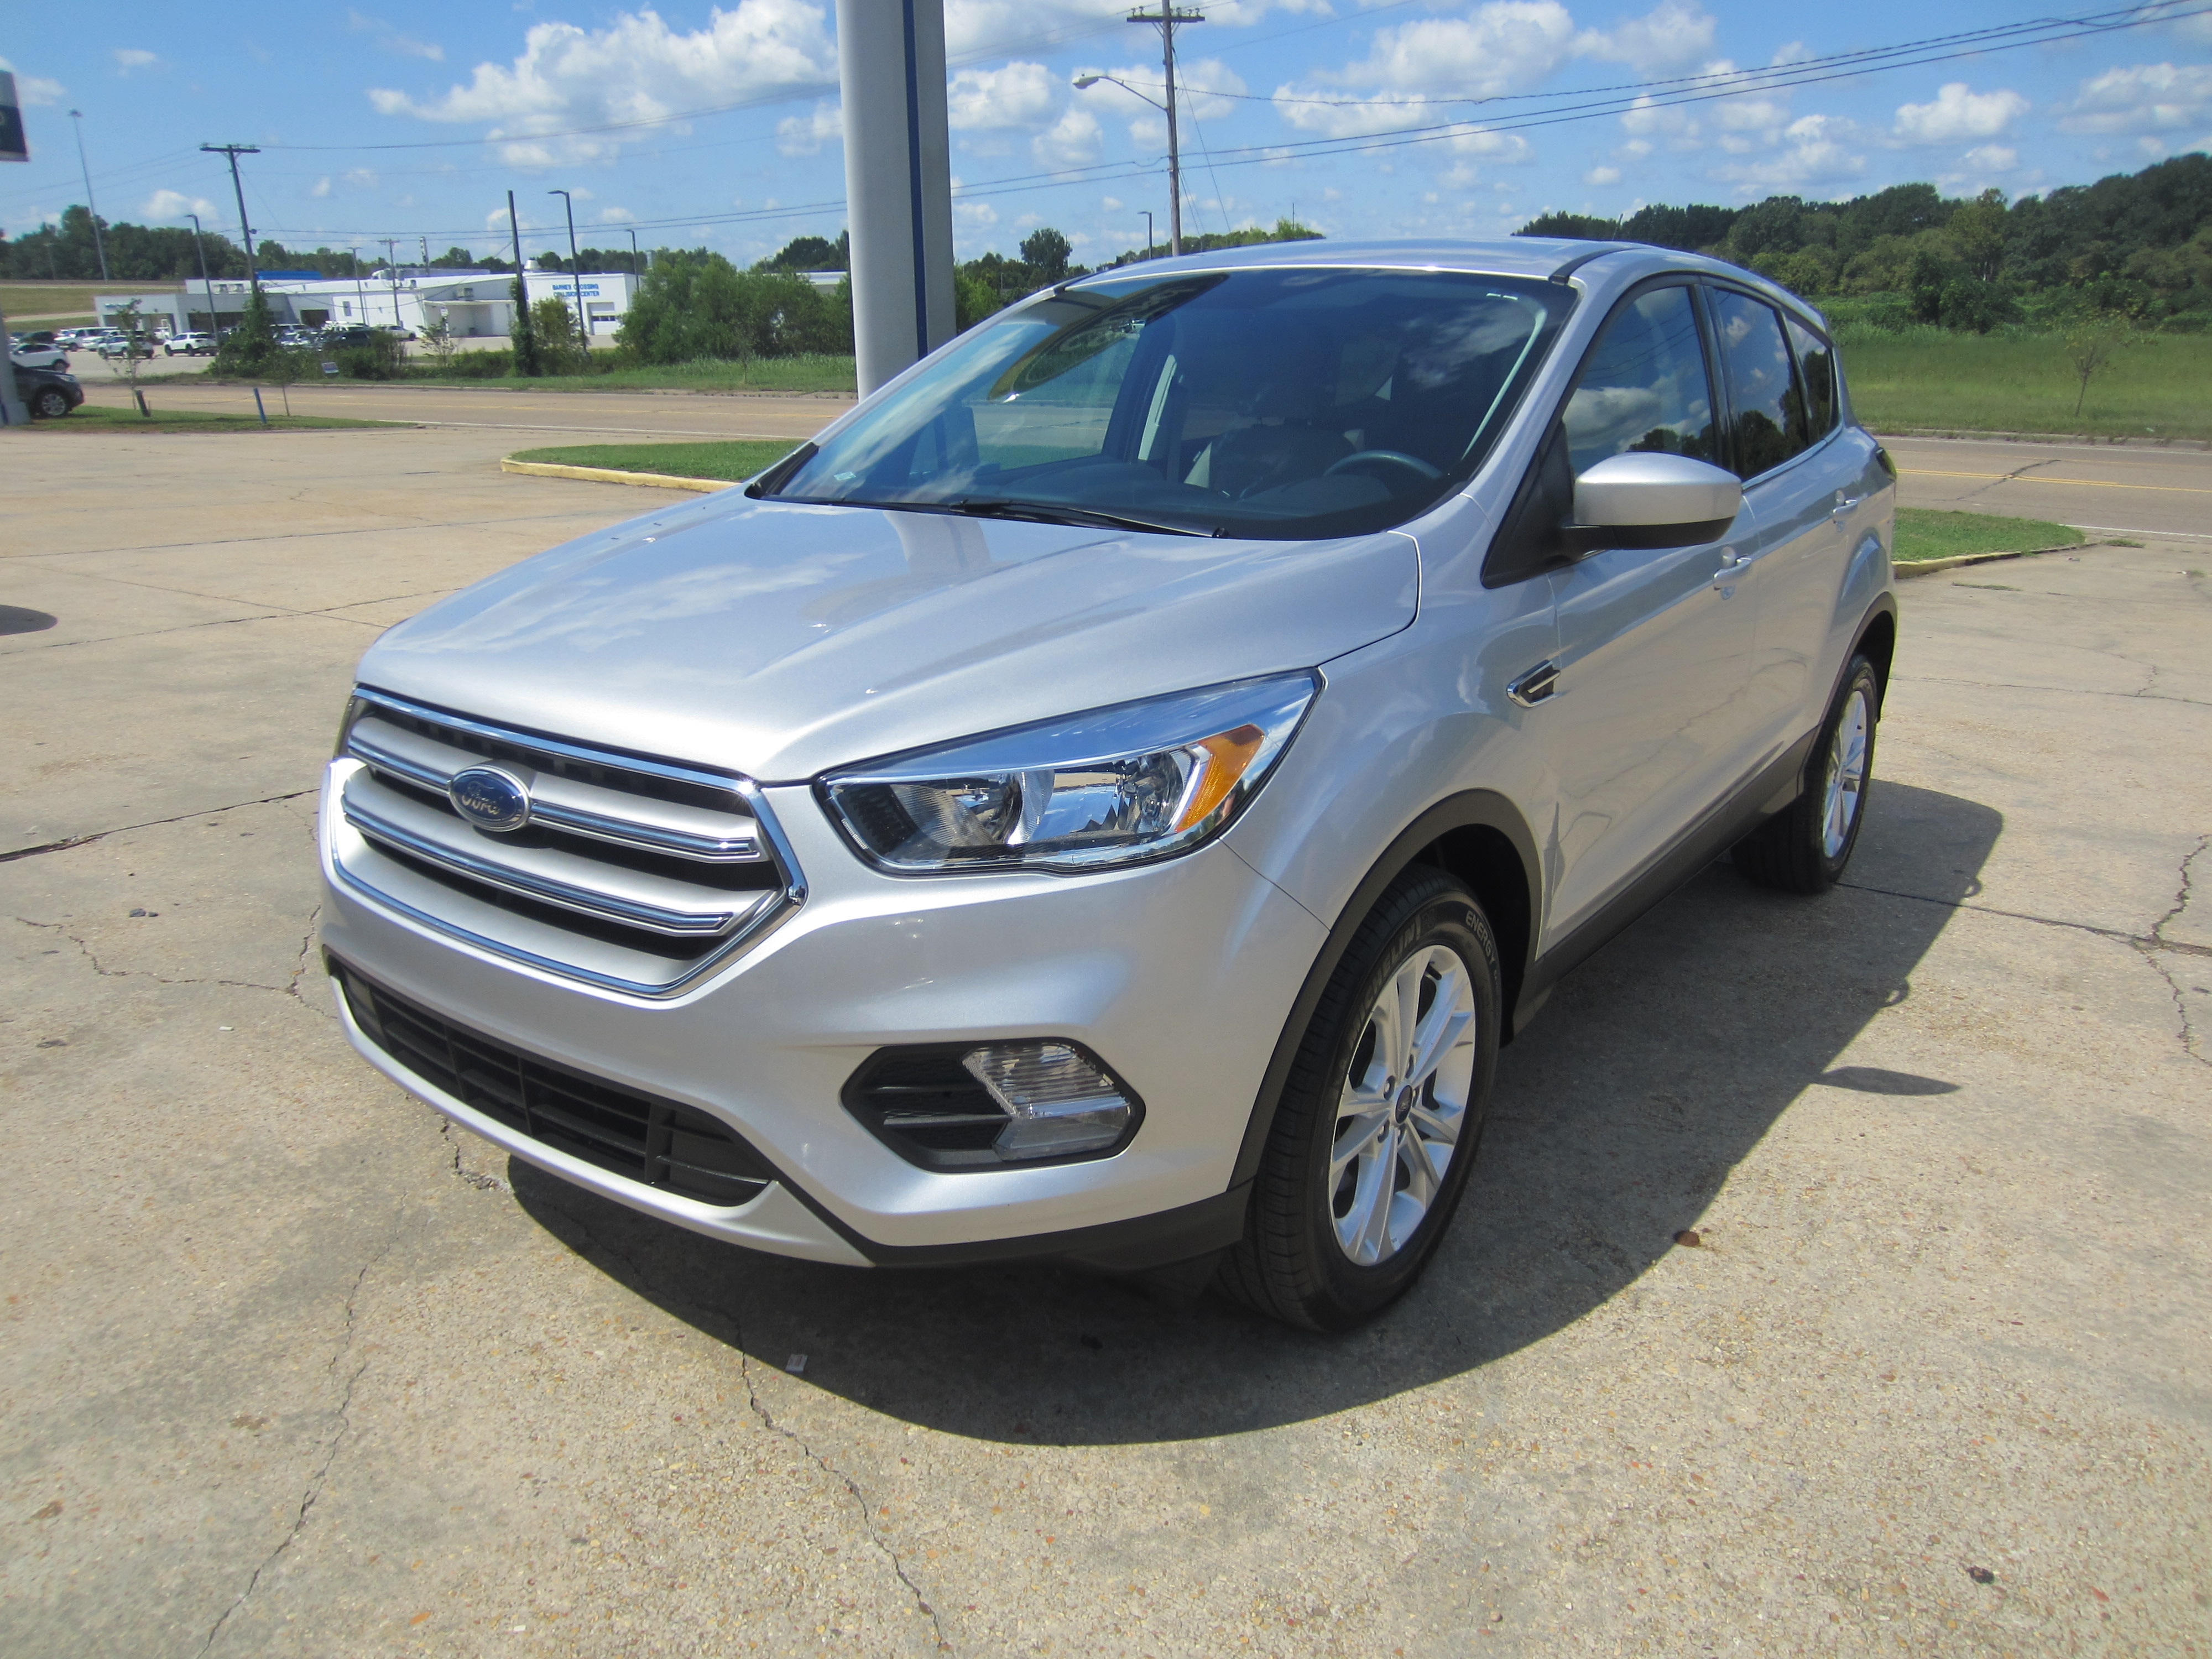 2017 Ford Escape SE Utility Vehicle